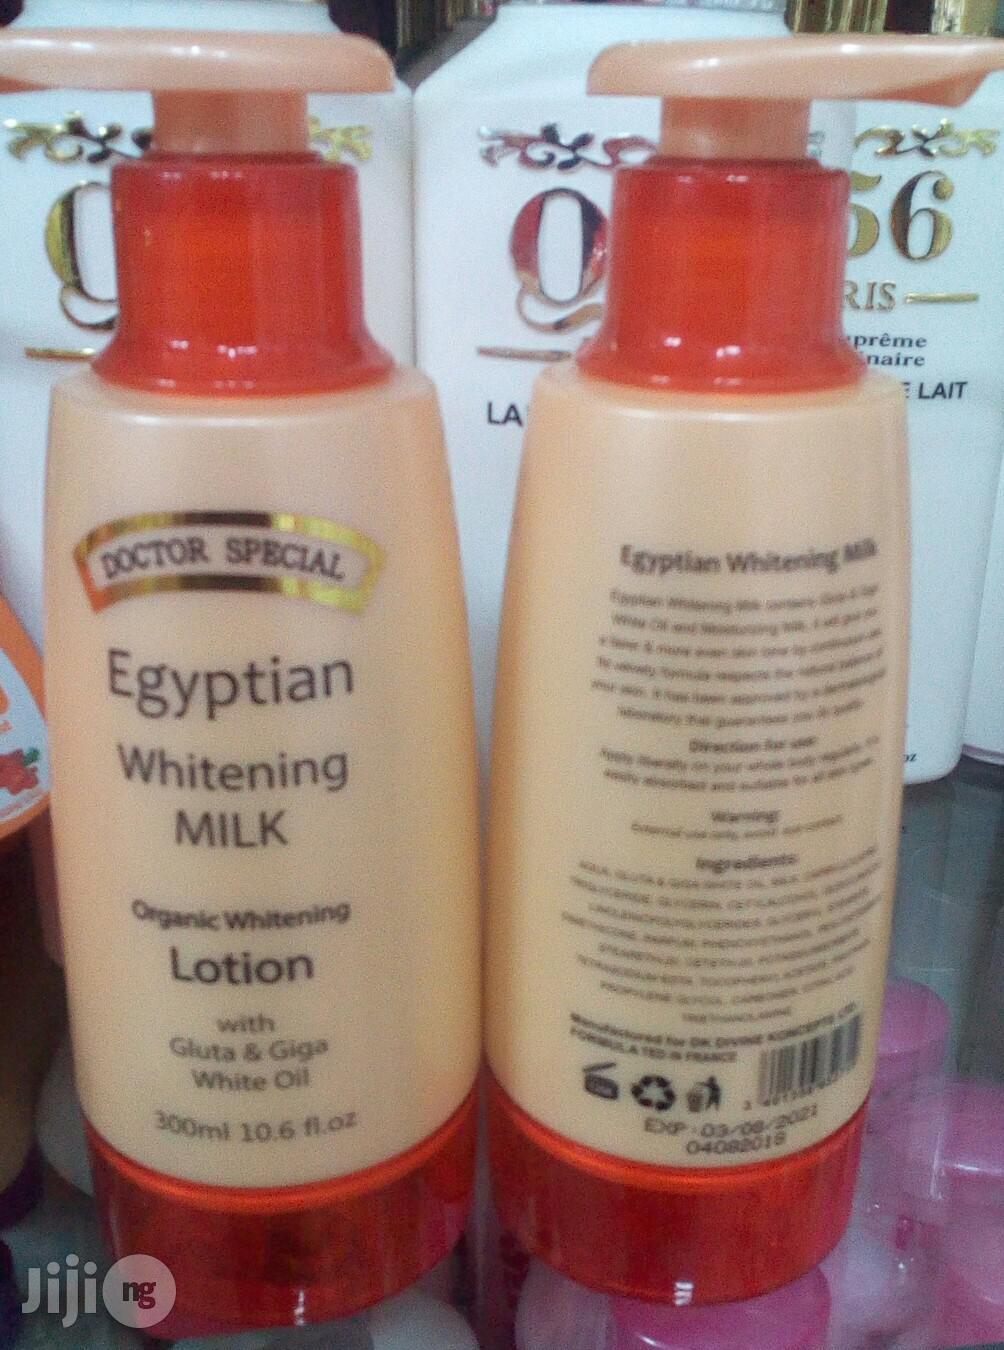 Doctor Special Egyptian Whitening Milk -300ml